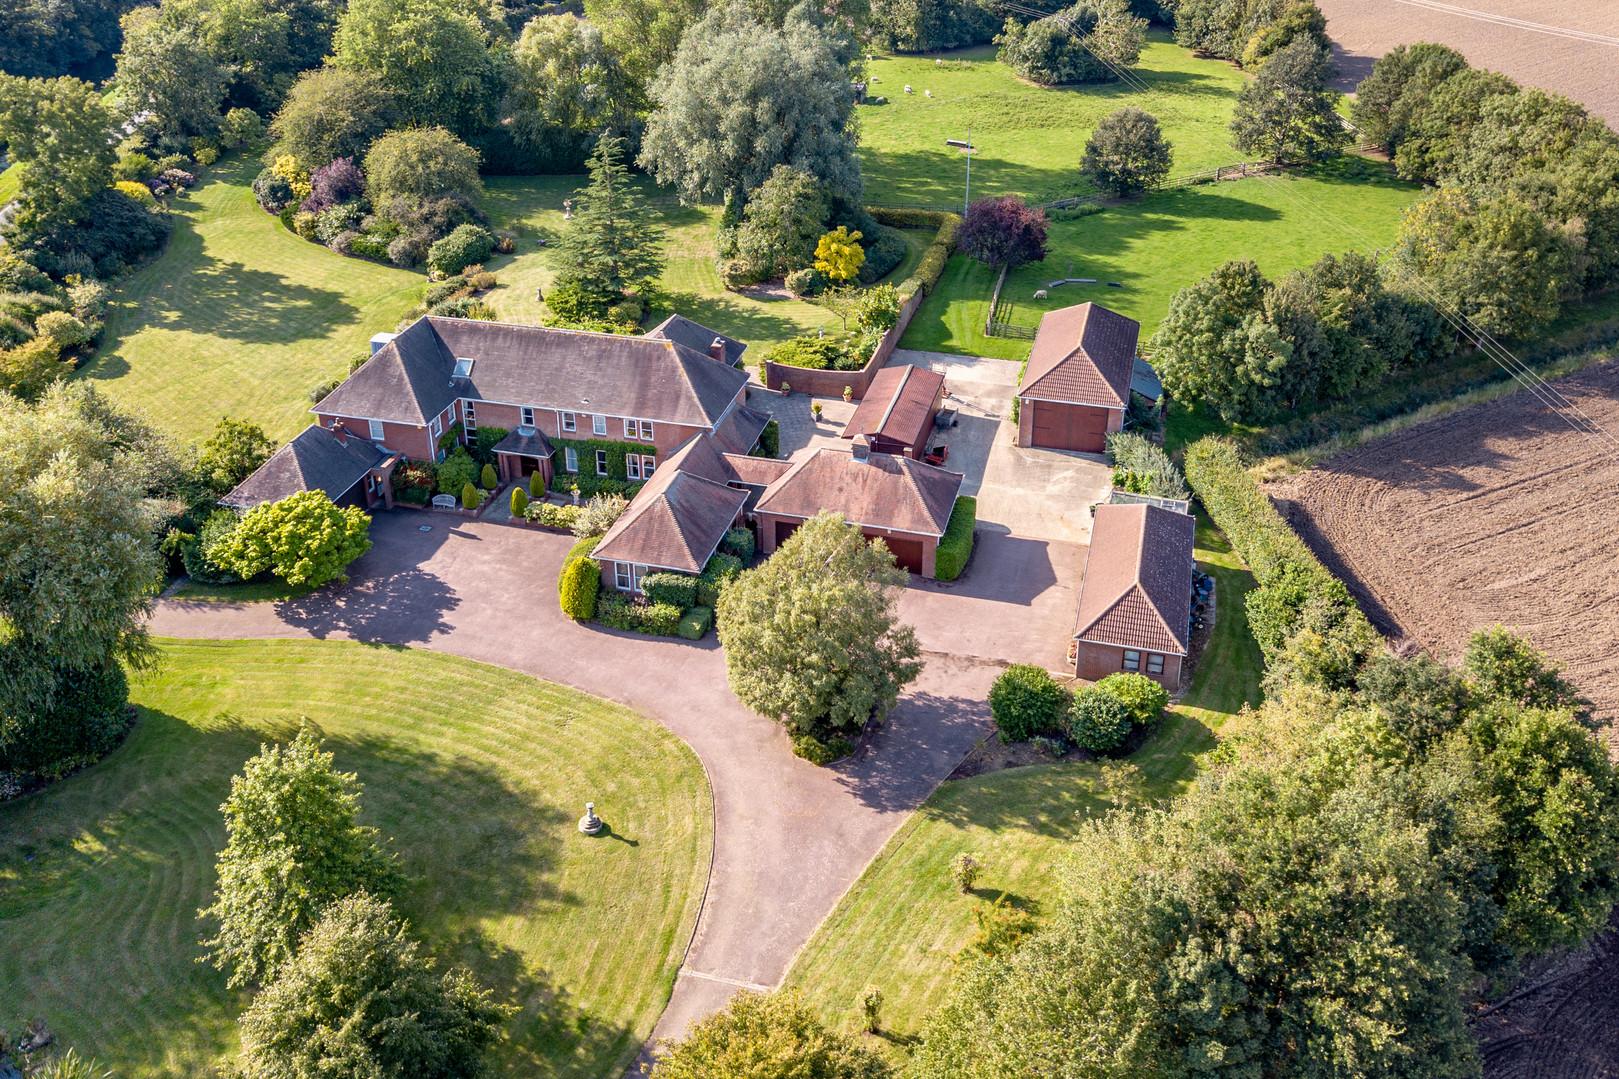 Holland House (Antons Gowt) Aerial-4.jpg